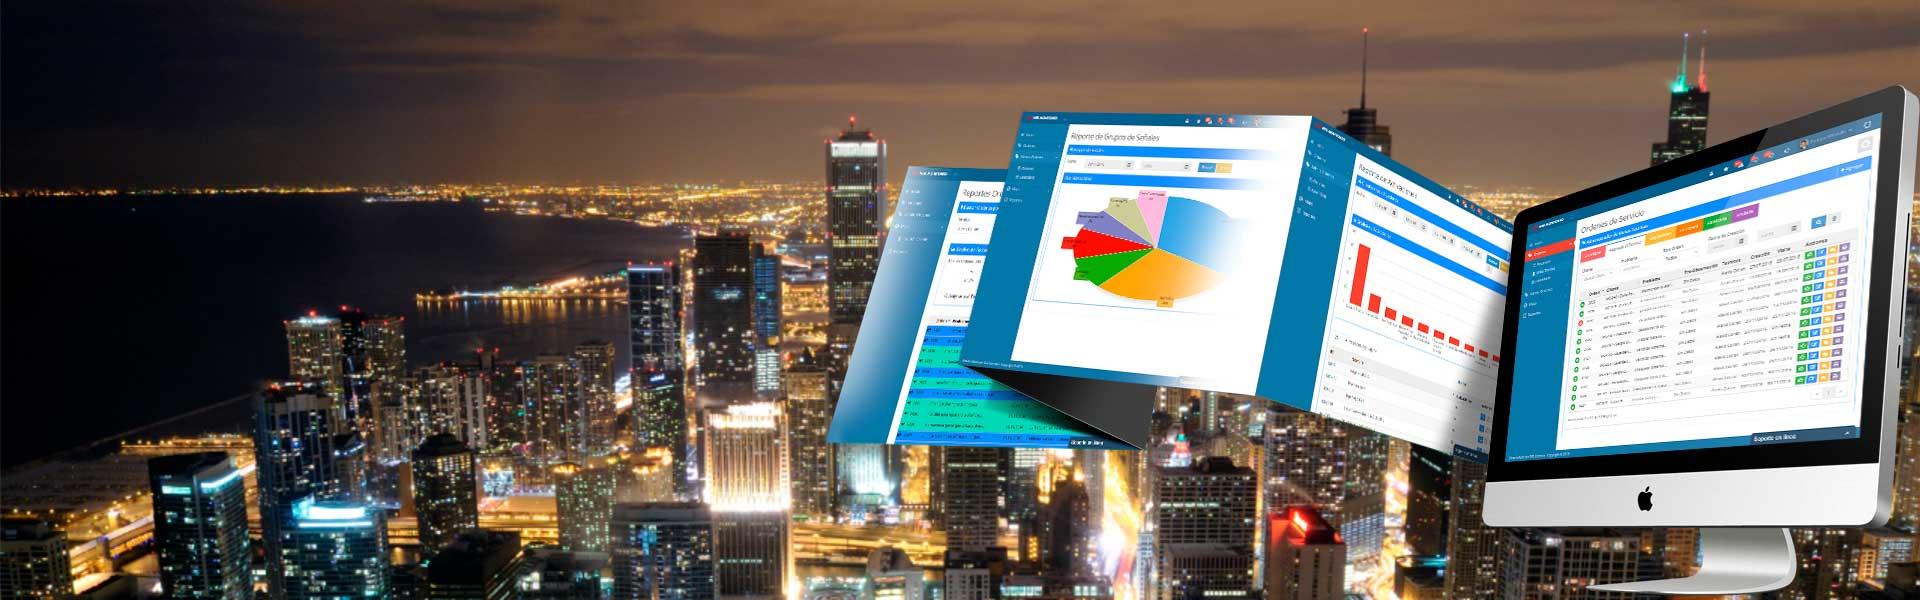 software-monitoreo-alarmas-rondas-web